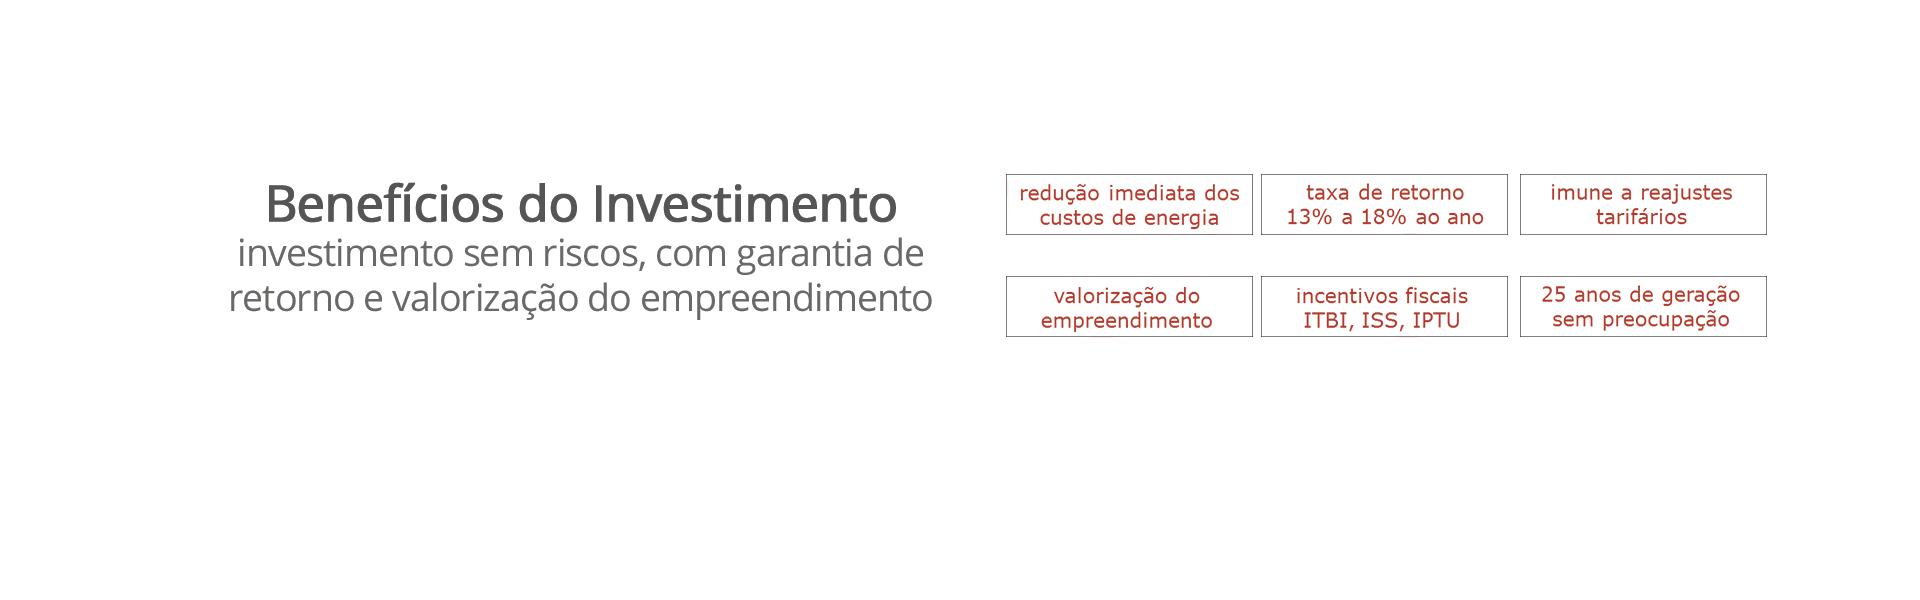 investimento-OlusAmerica